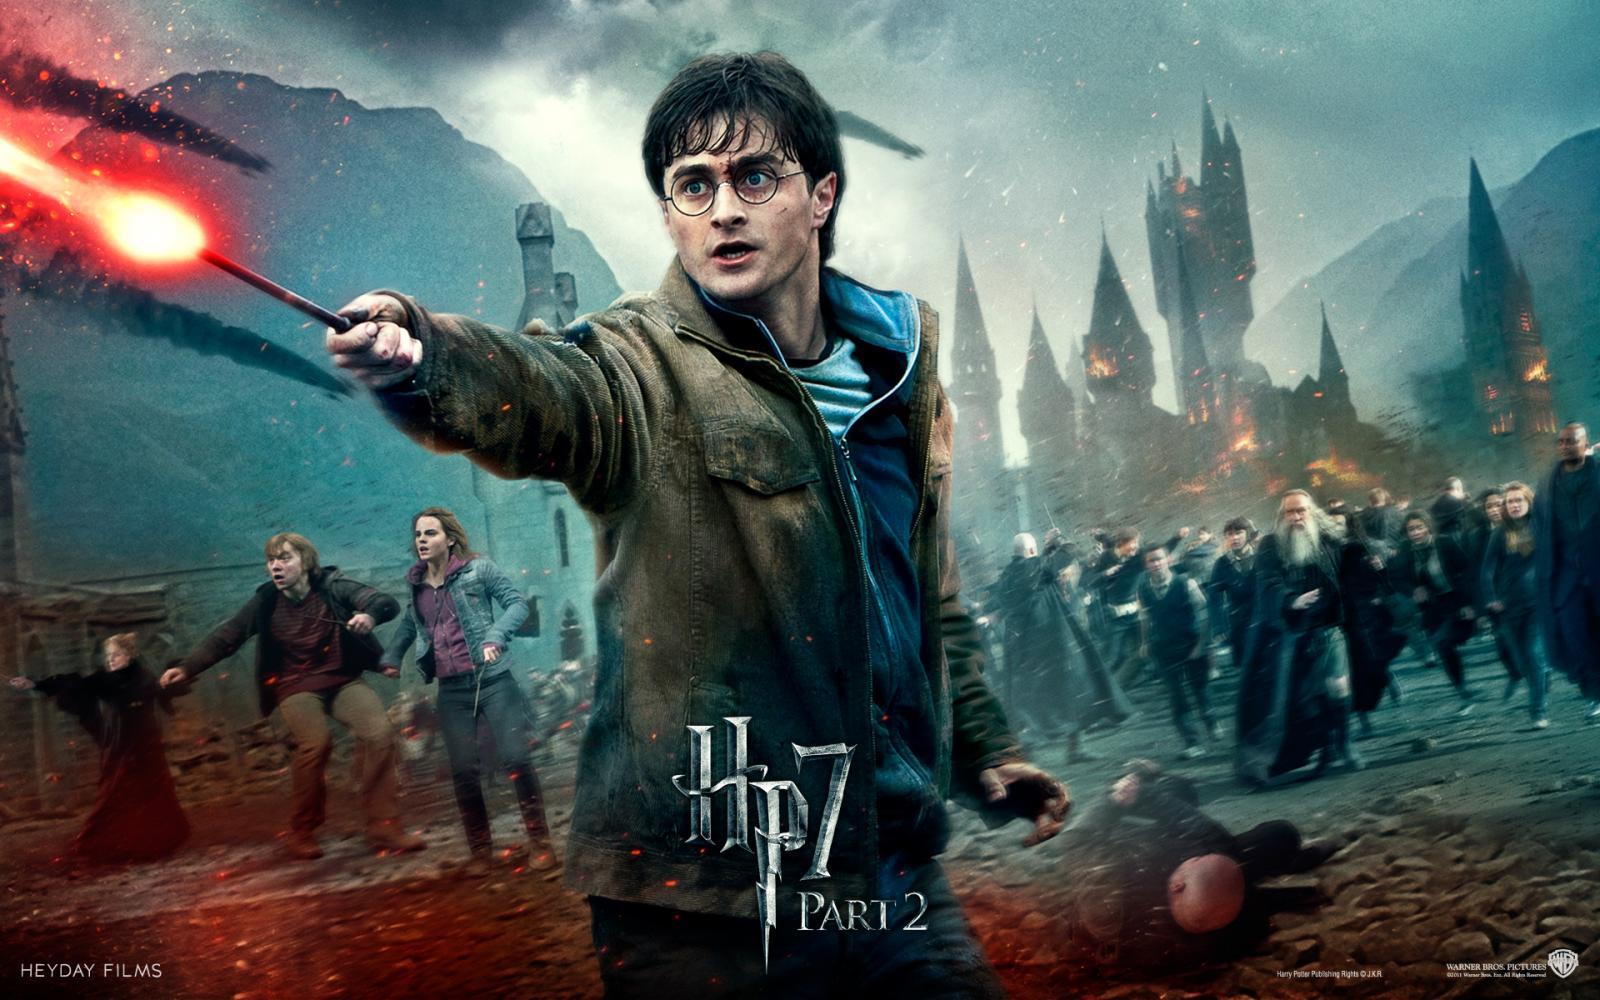 Wallpaper Harry Potter HP7 fight hero Harry Potter - Daniel Radcliffe